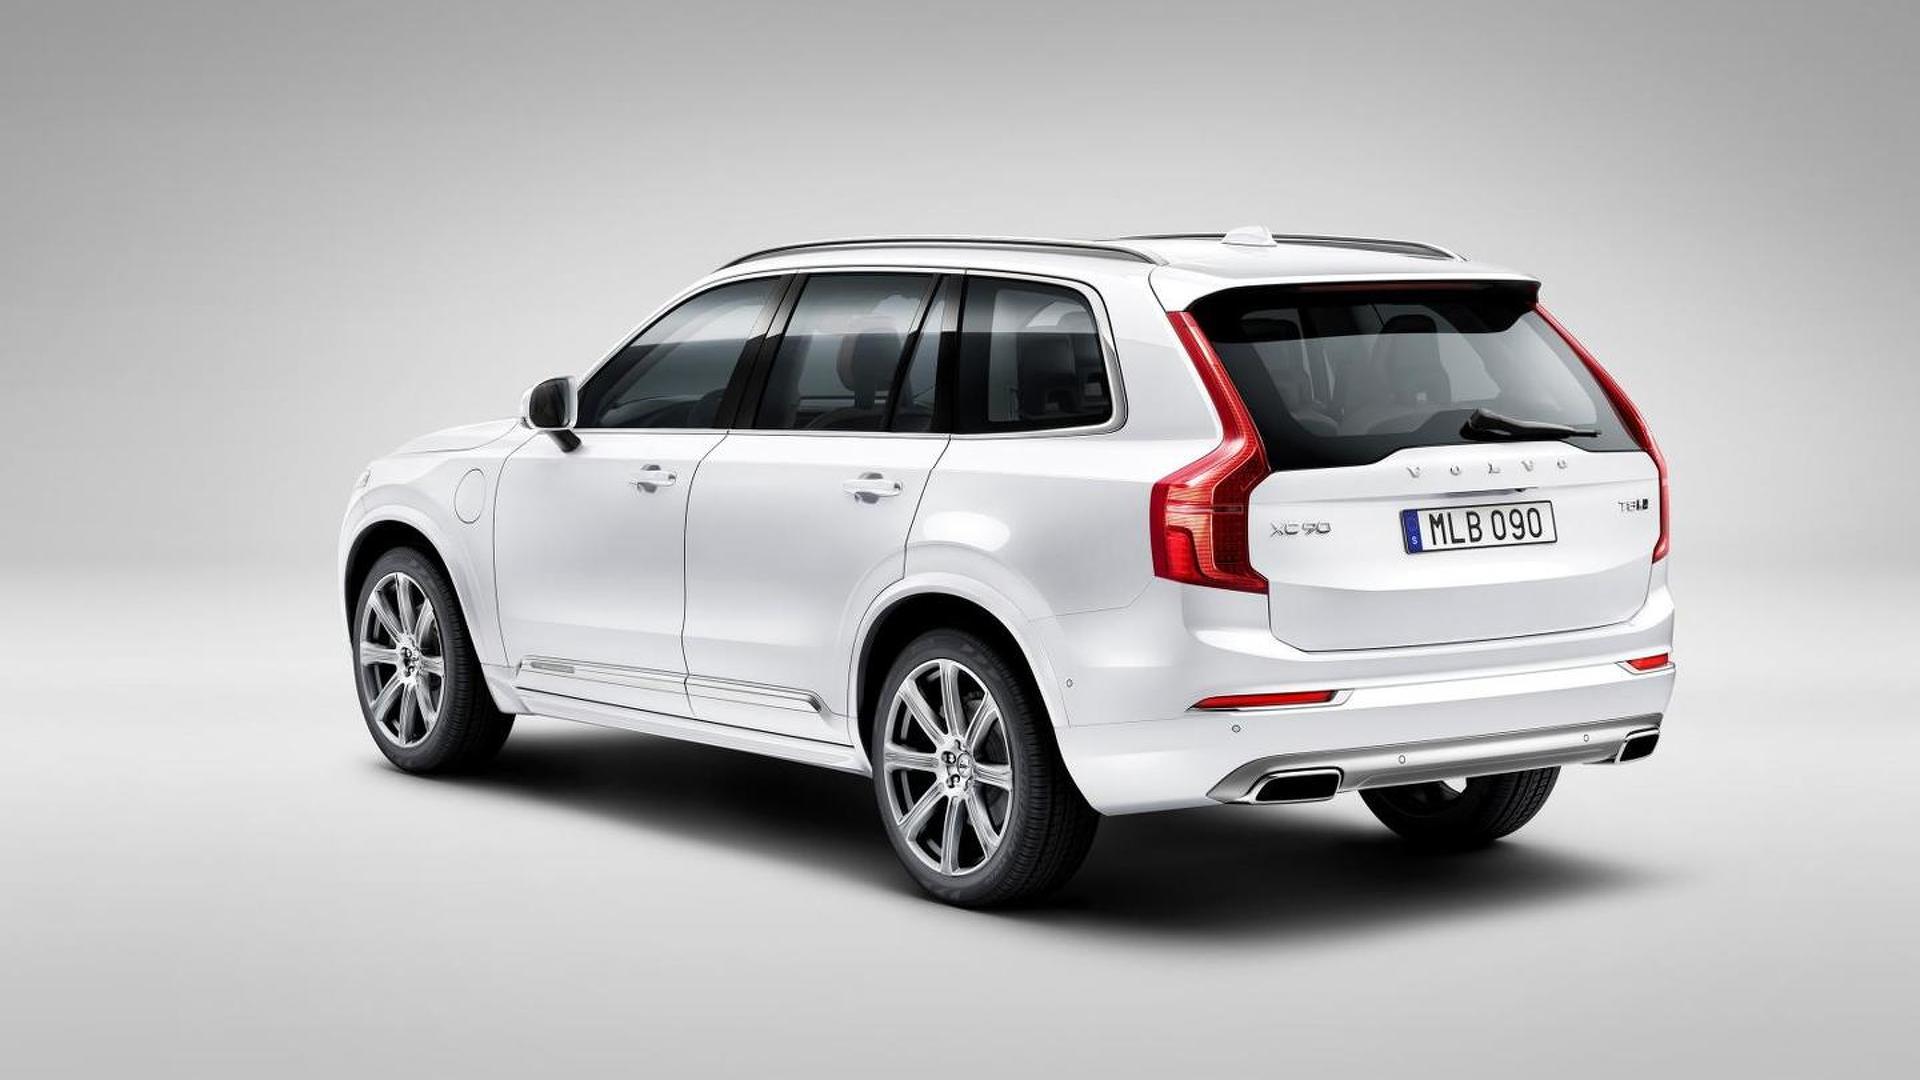 New Volvo Xc90 >> Crash Testing The New Volvo Xc90 Video